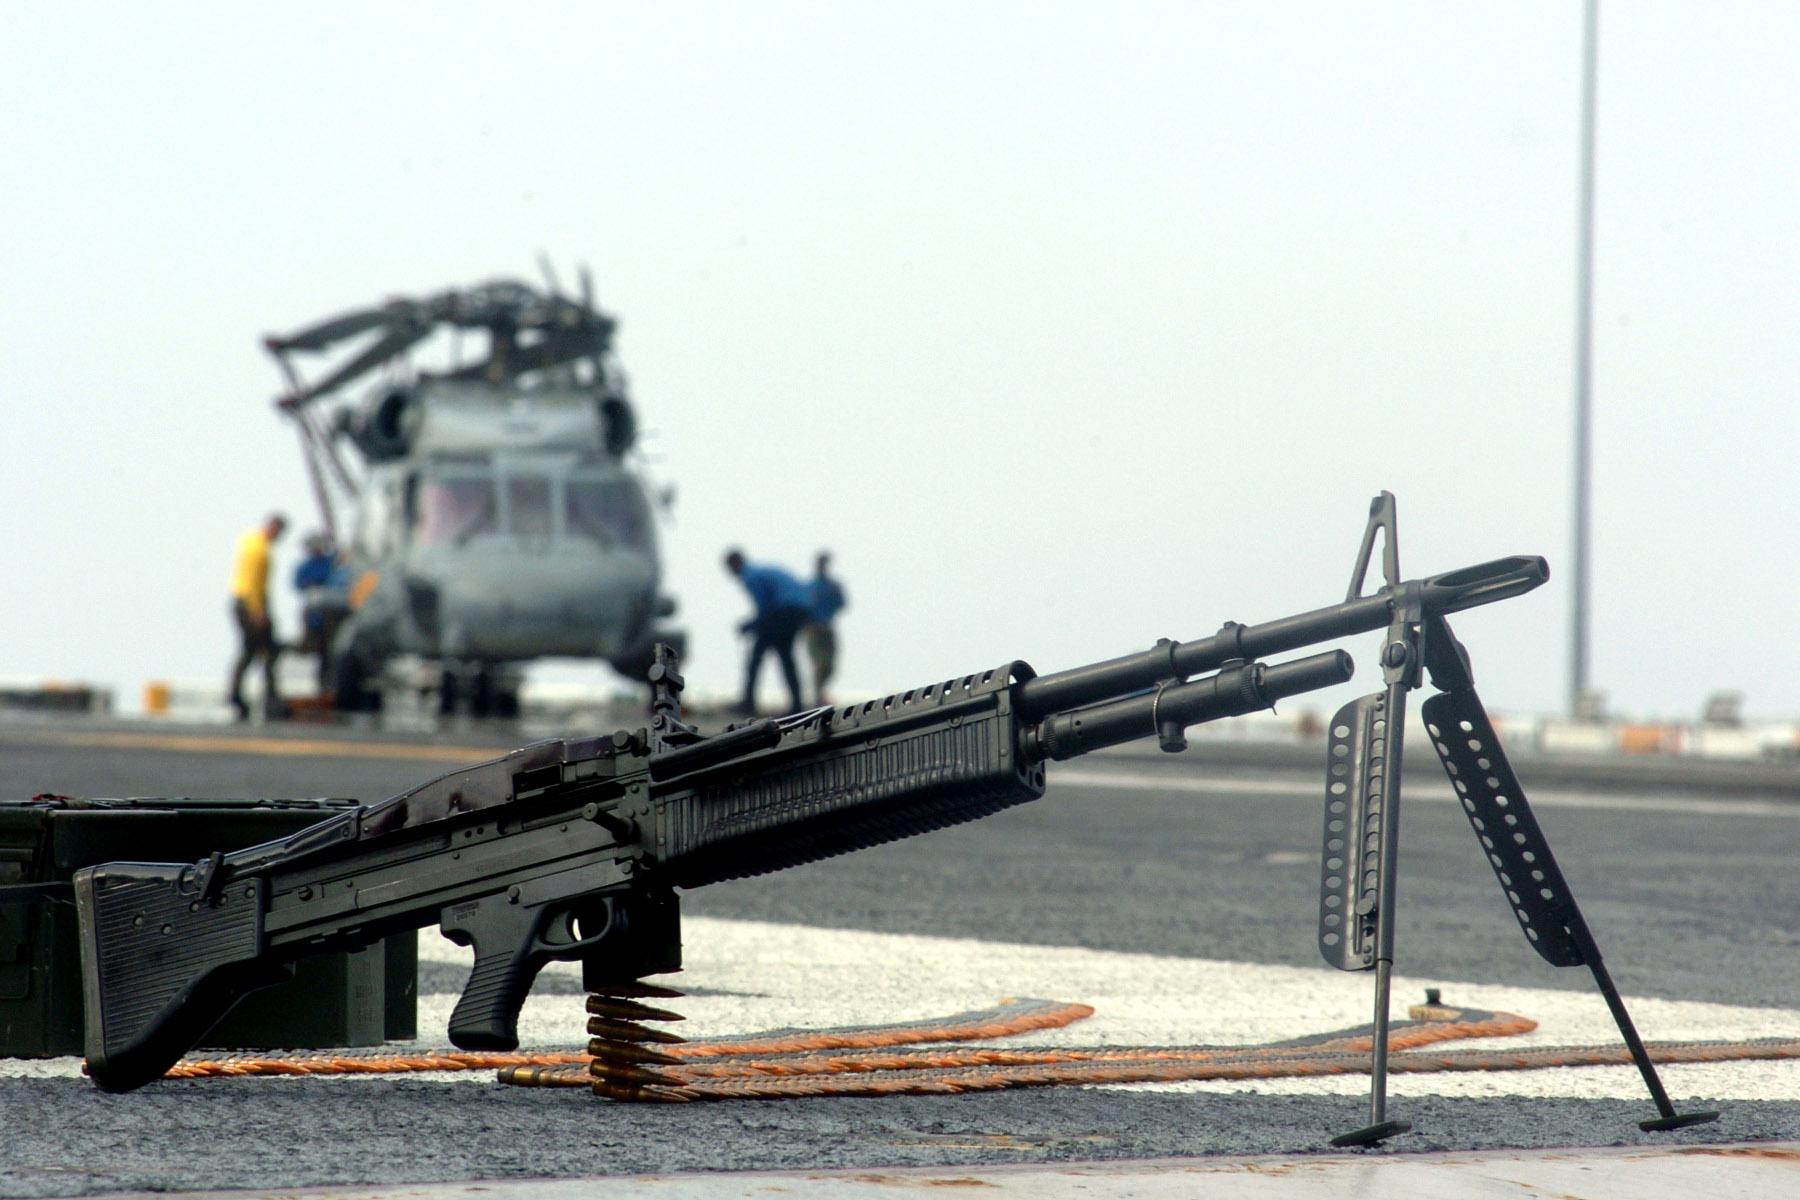 M60 MACHINE GUN military rifle weapon g wallpaper background 1800x1200